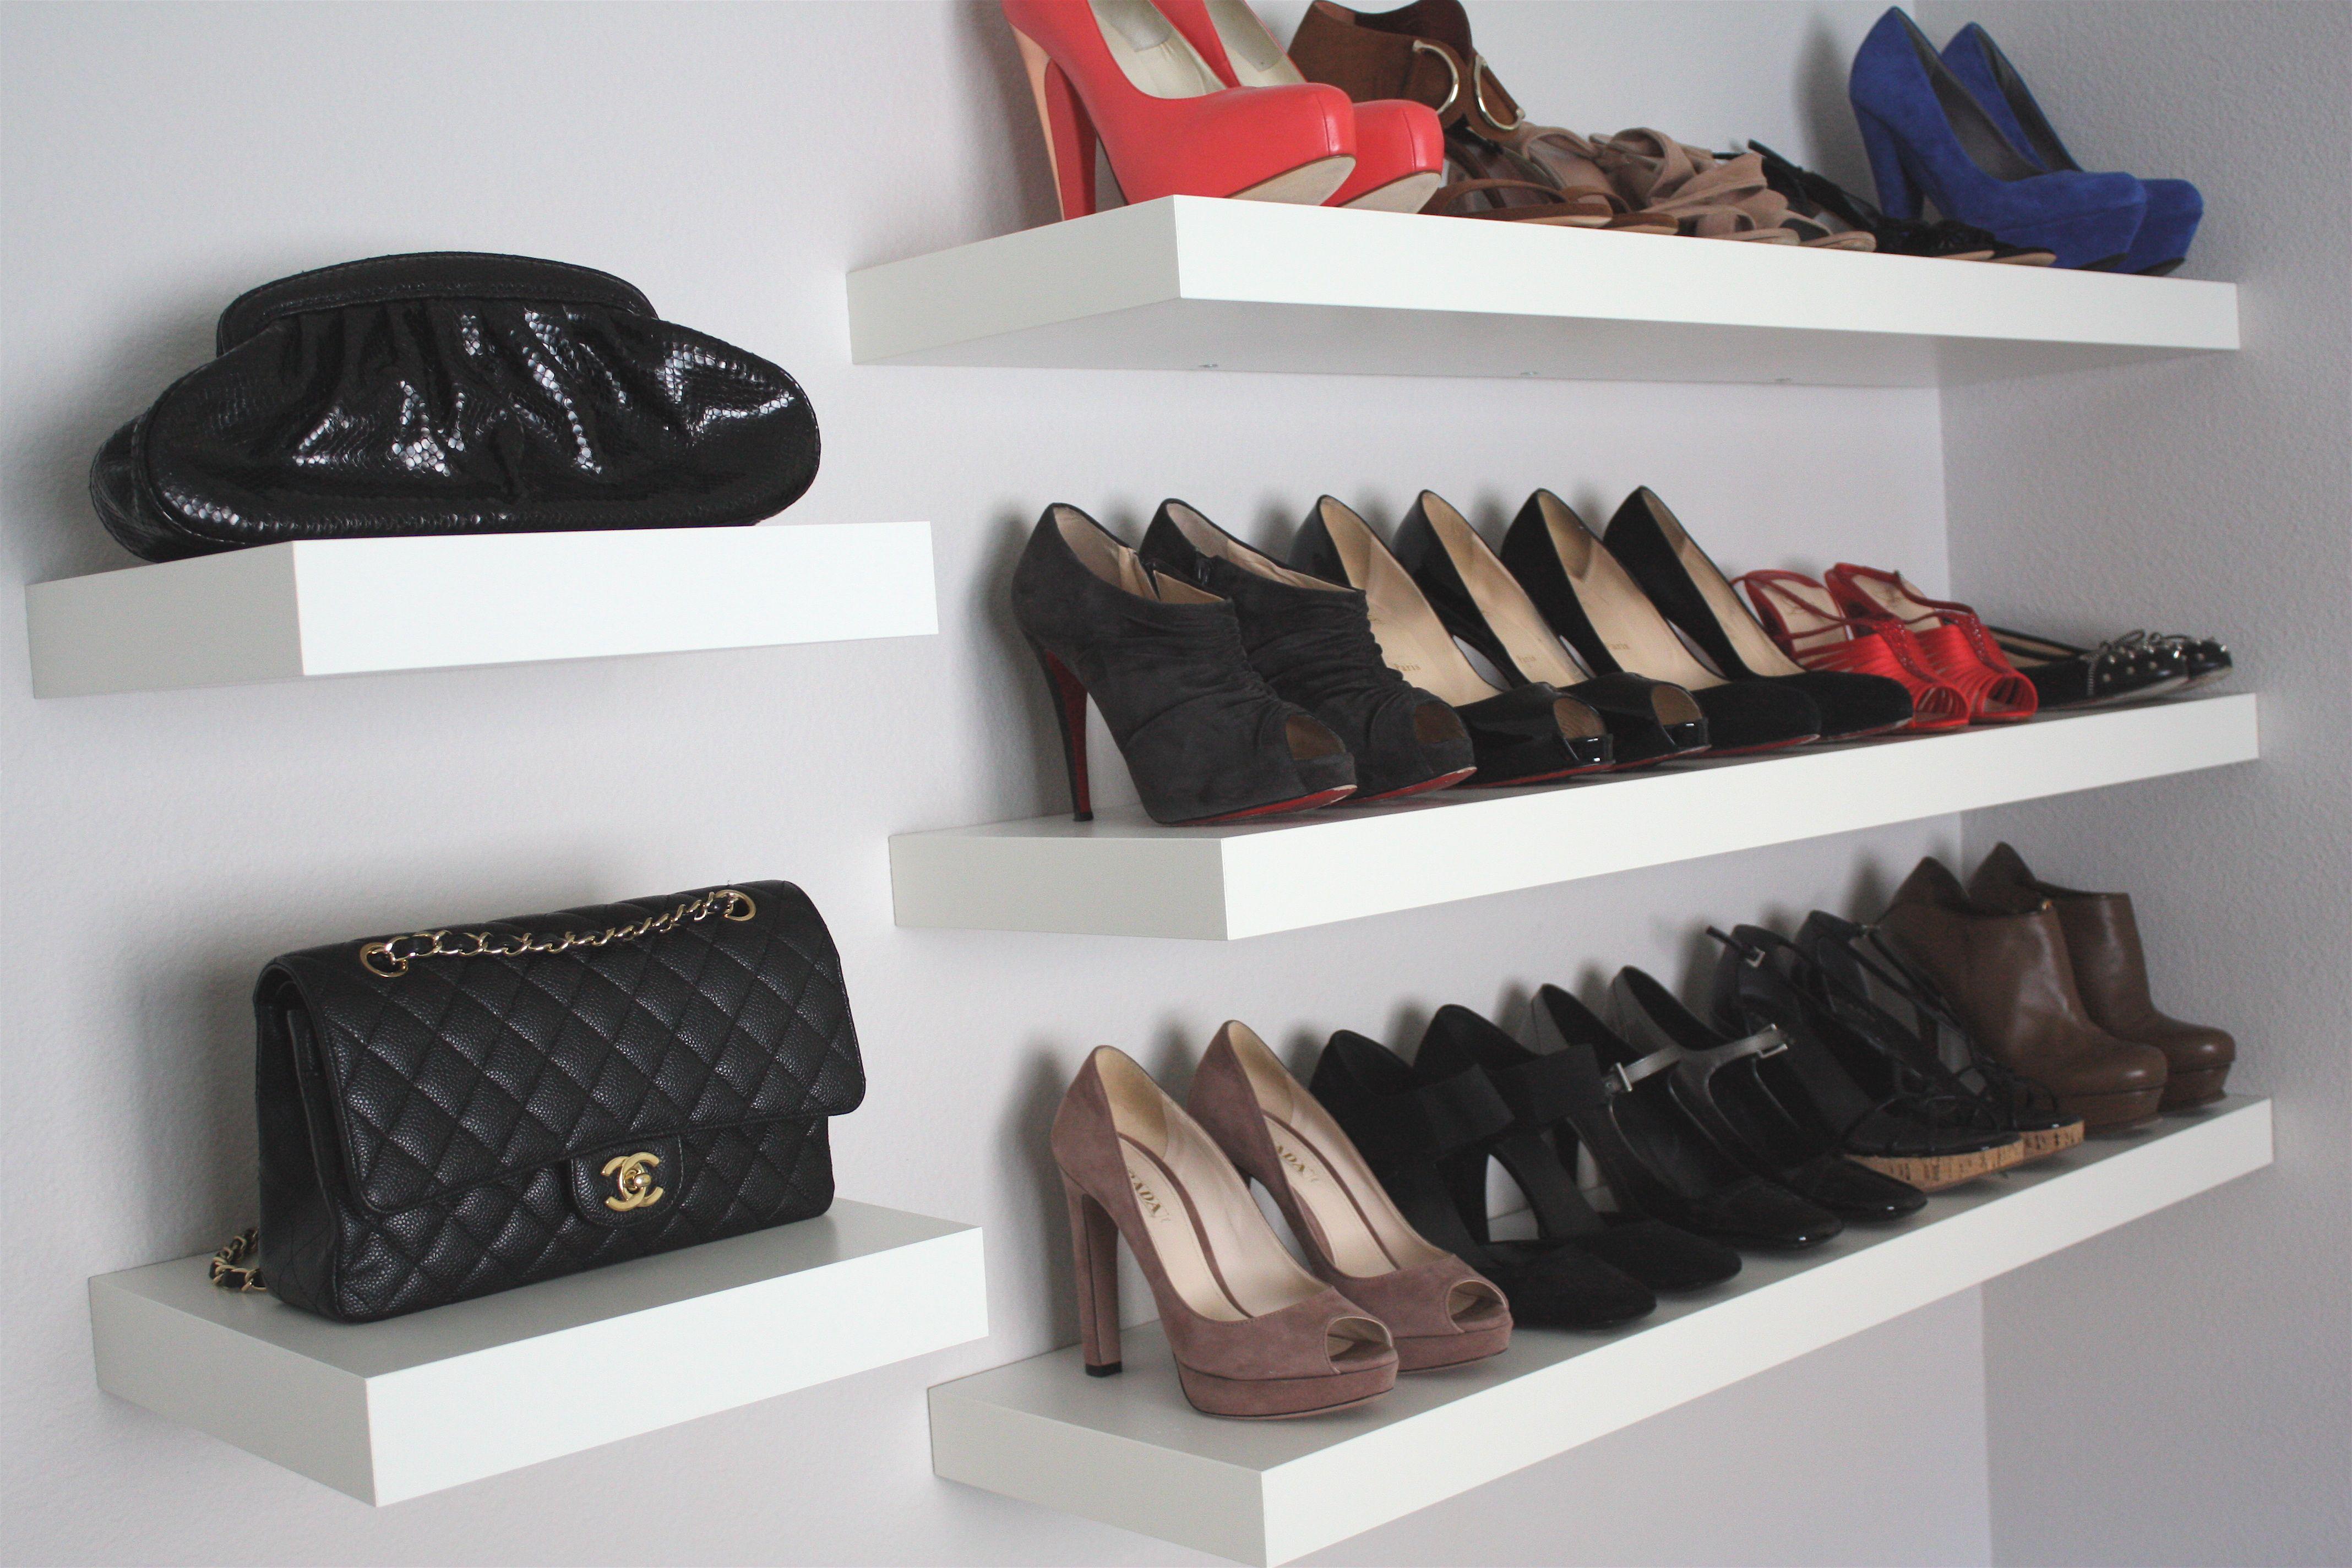 wall shelves for shoes and bags Ikea lack shelves, Ikea